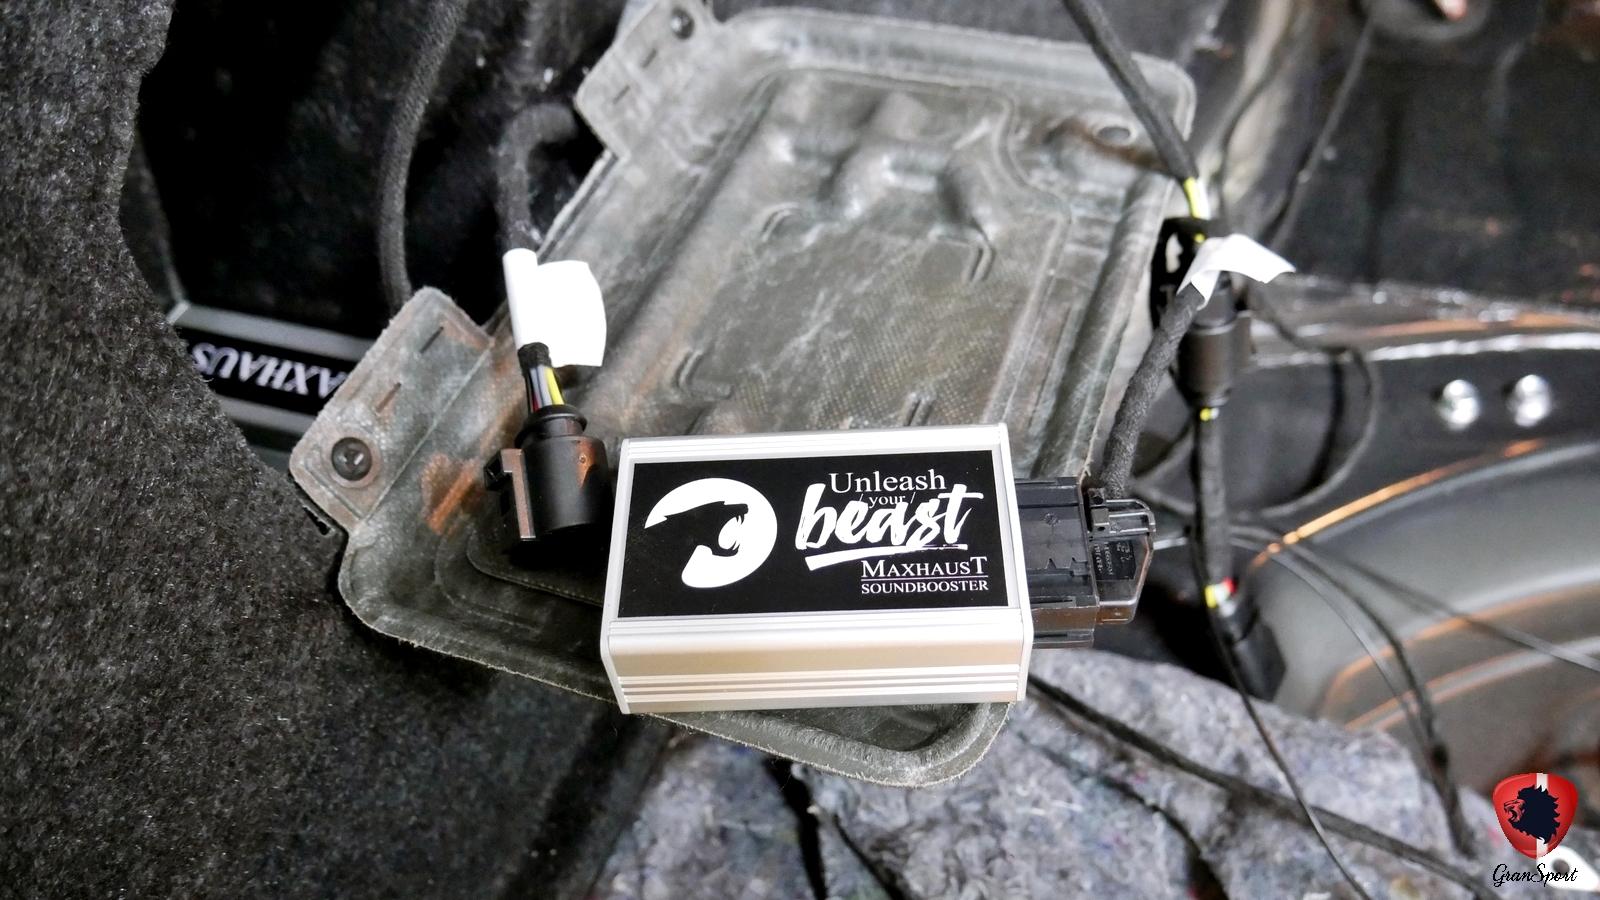 Infiniti Q60 Coupe Maxhaust